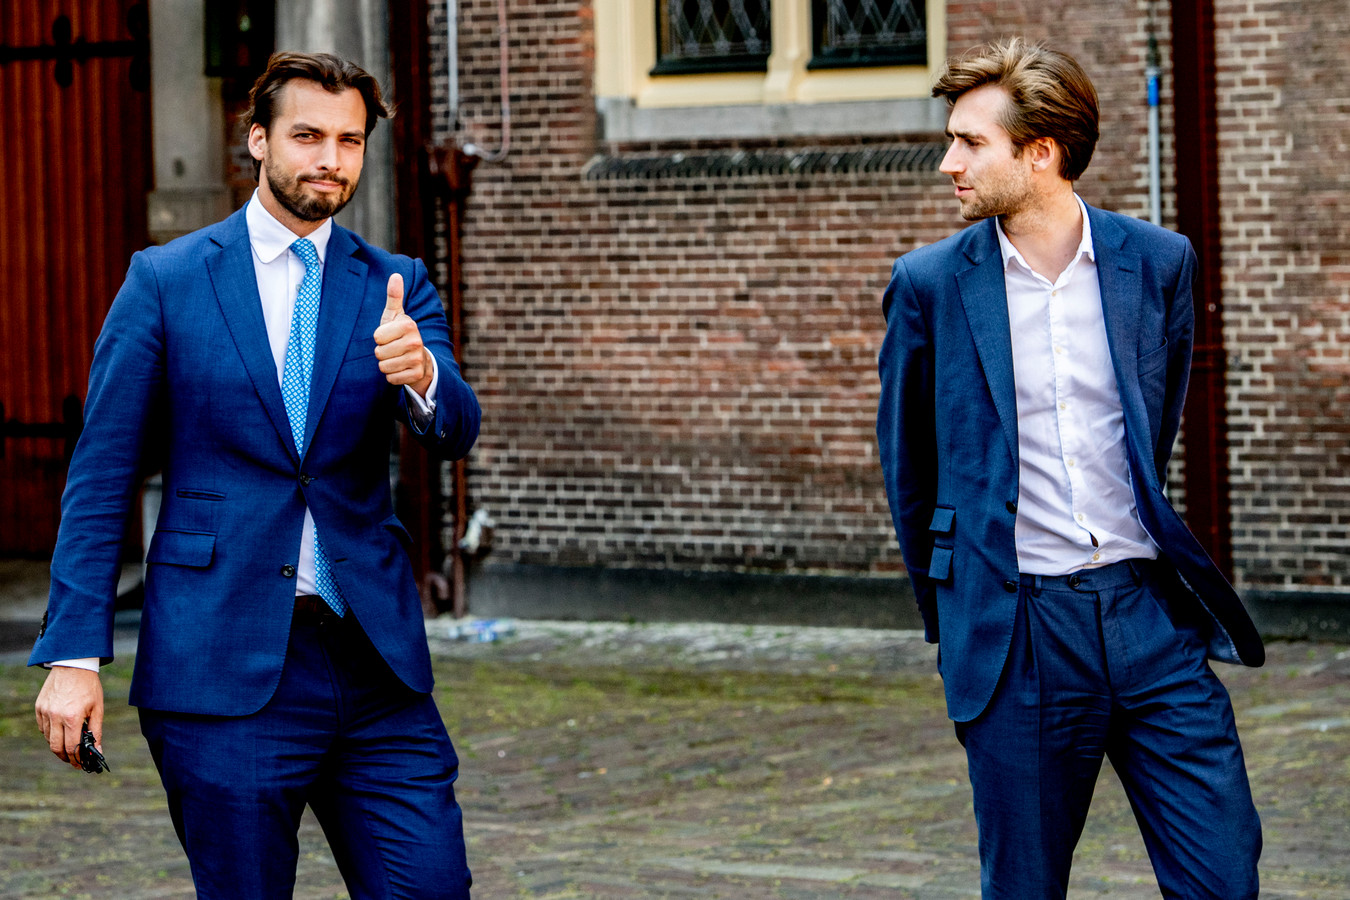 Baudet en zijn boezemvriend Freek Jansen.